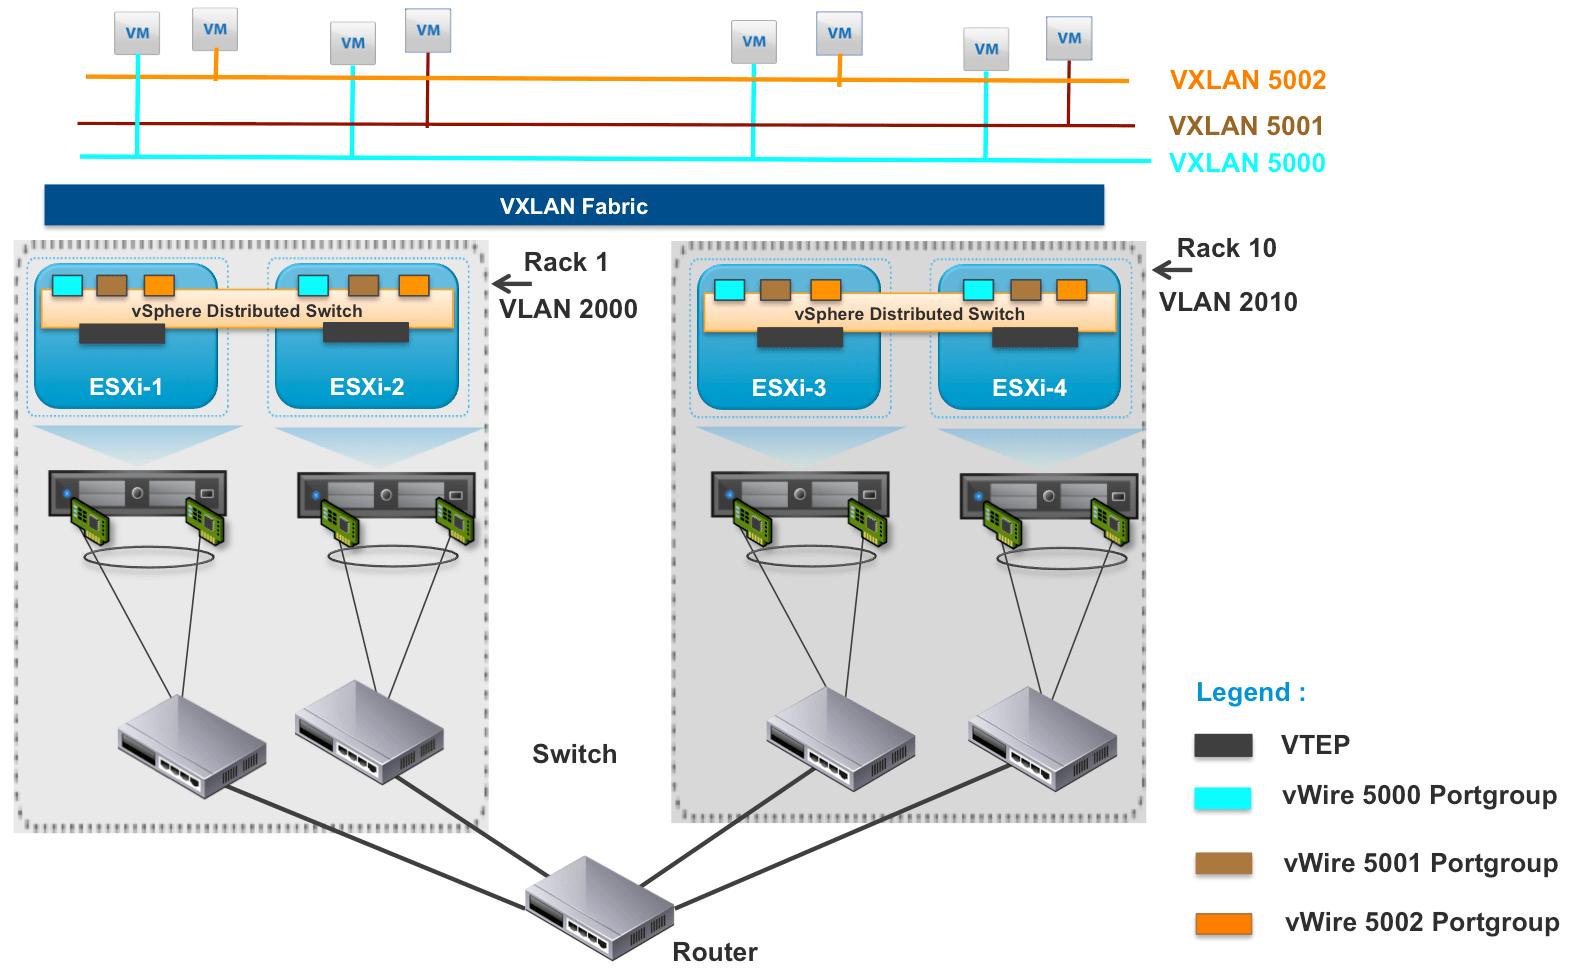 vmware virtual server diagram 2 way light switch wiring nz network i must overlay thee a meditation on otv vxlan